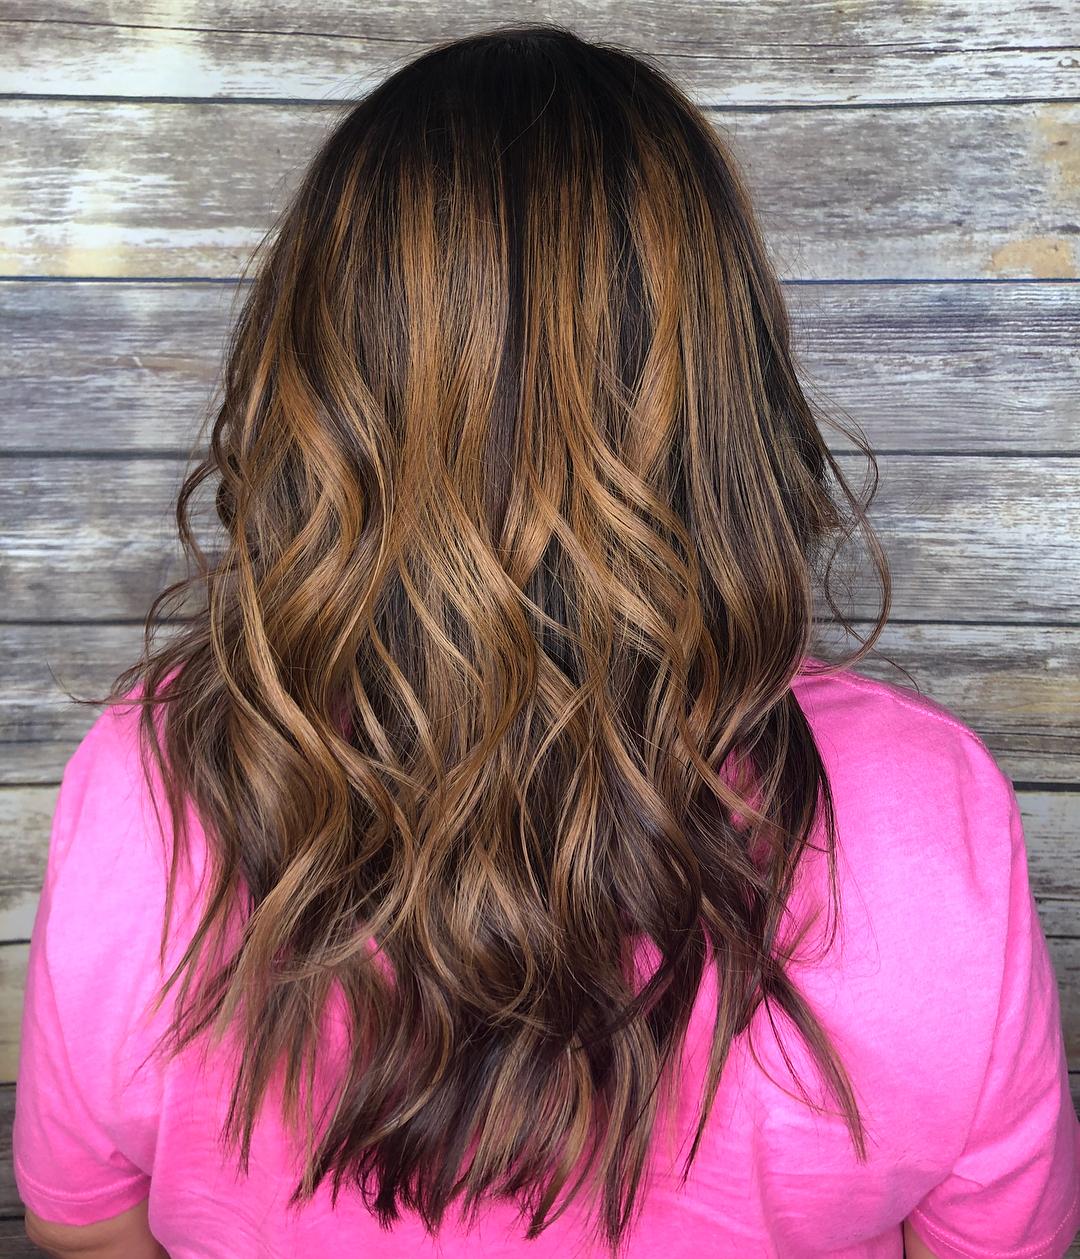 Chocolate and Caramel Balayage Curls